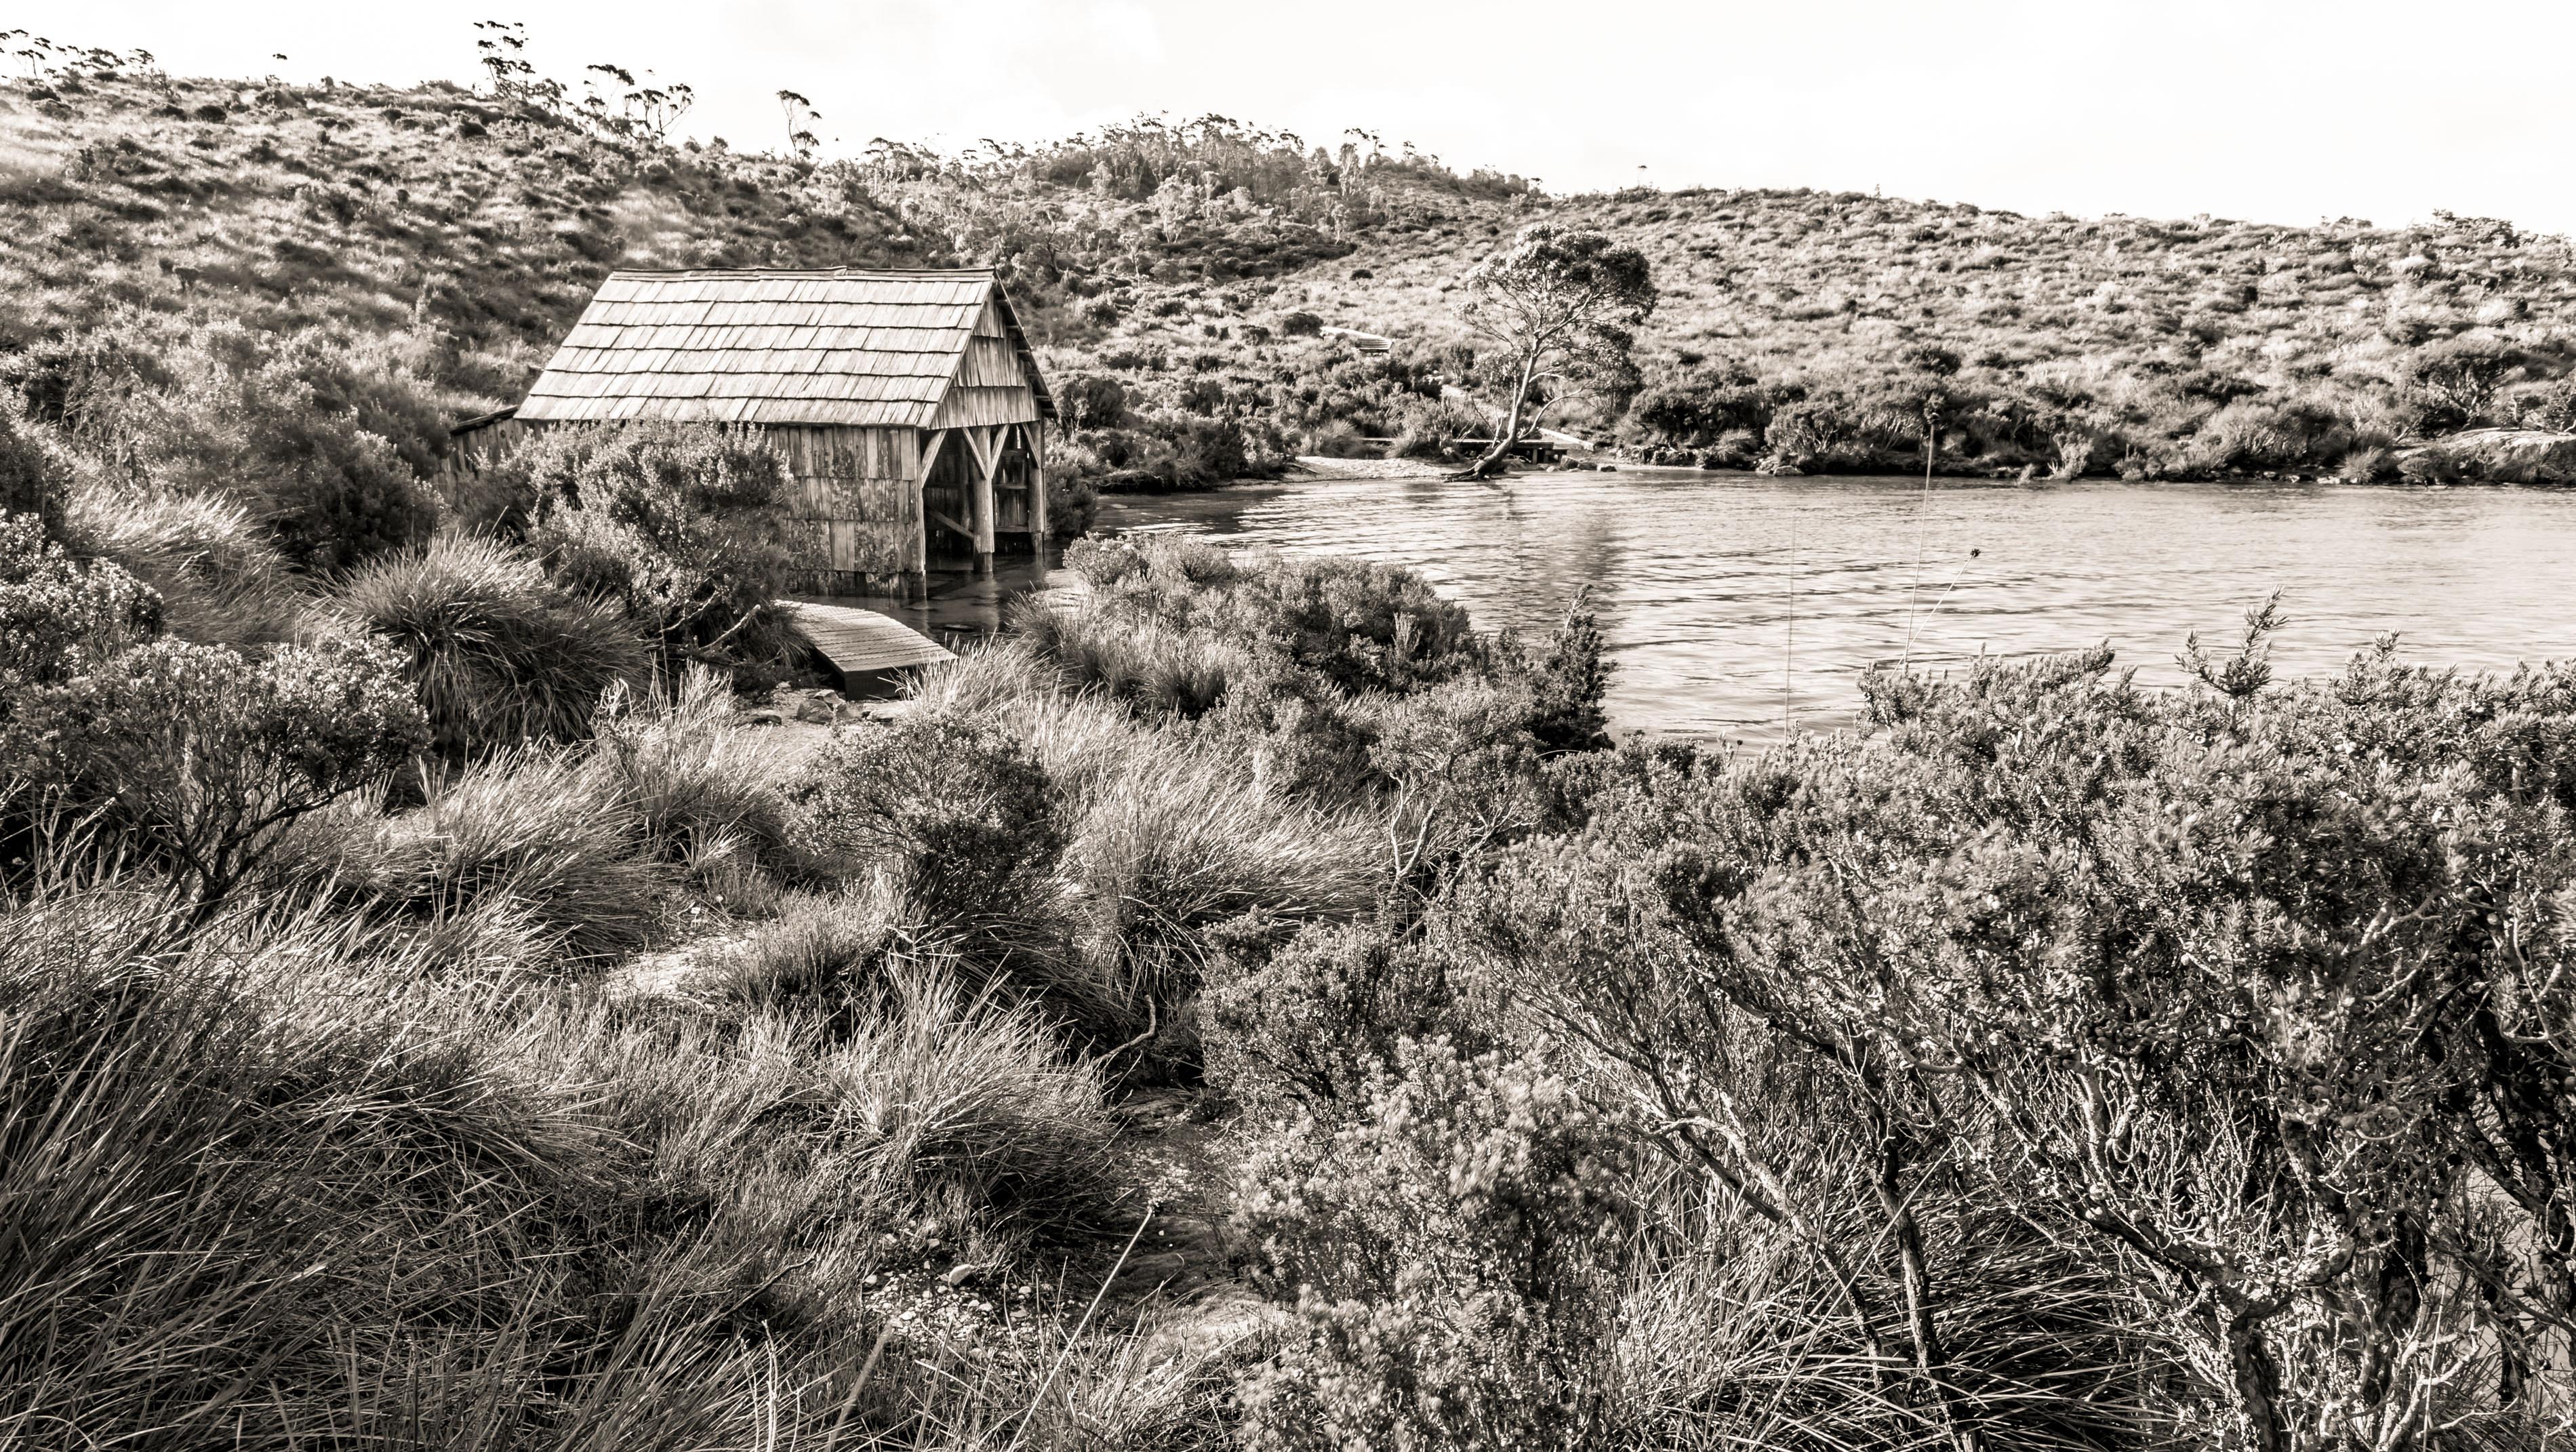 Travel photography in Tasmania - Cradle Mountain Shack